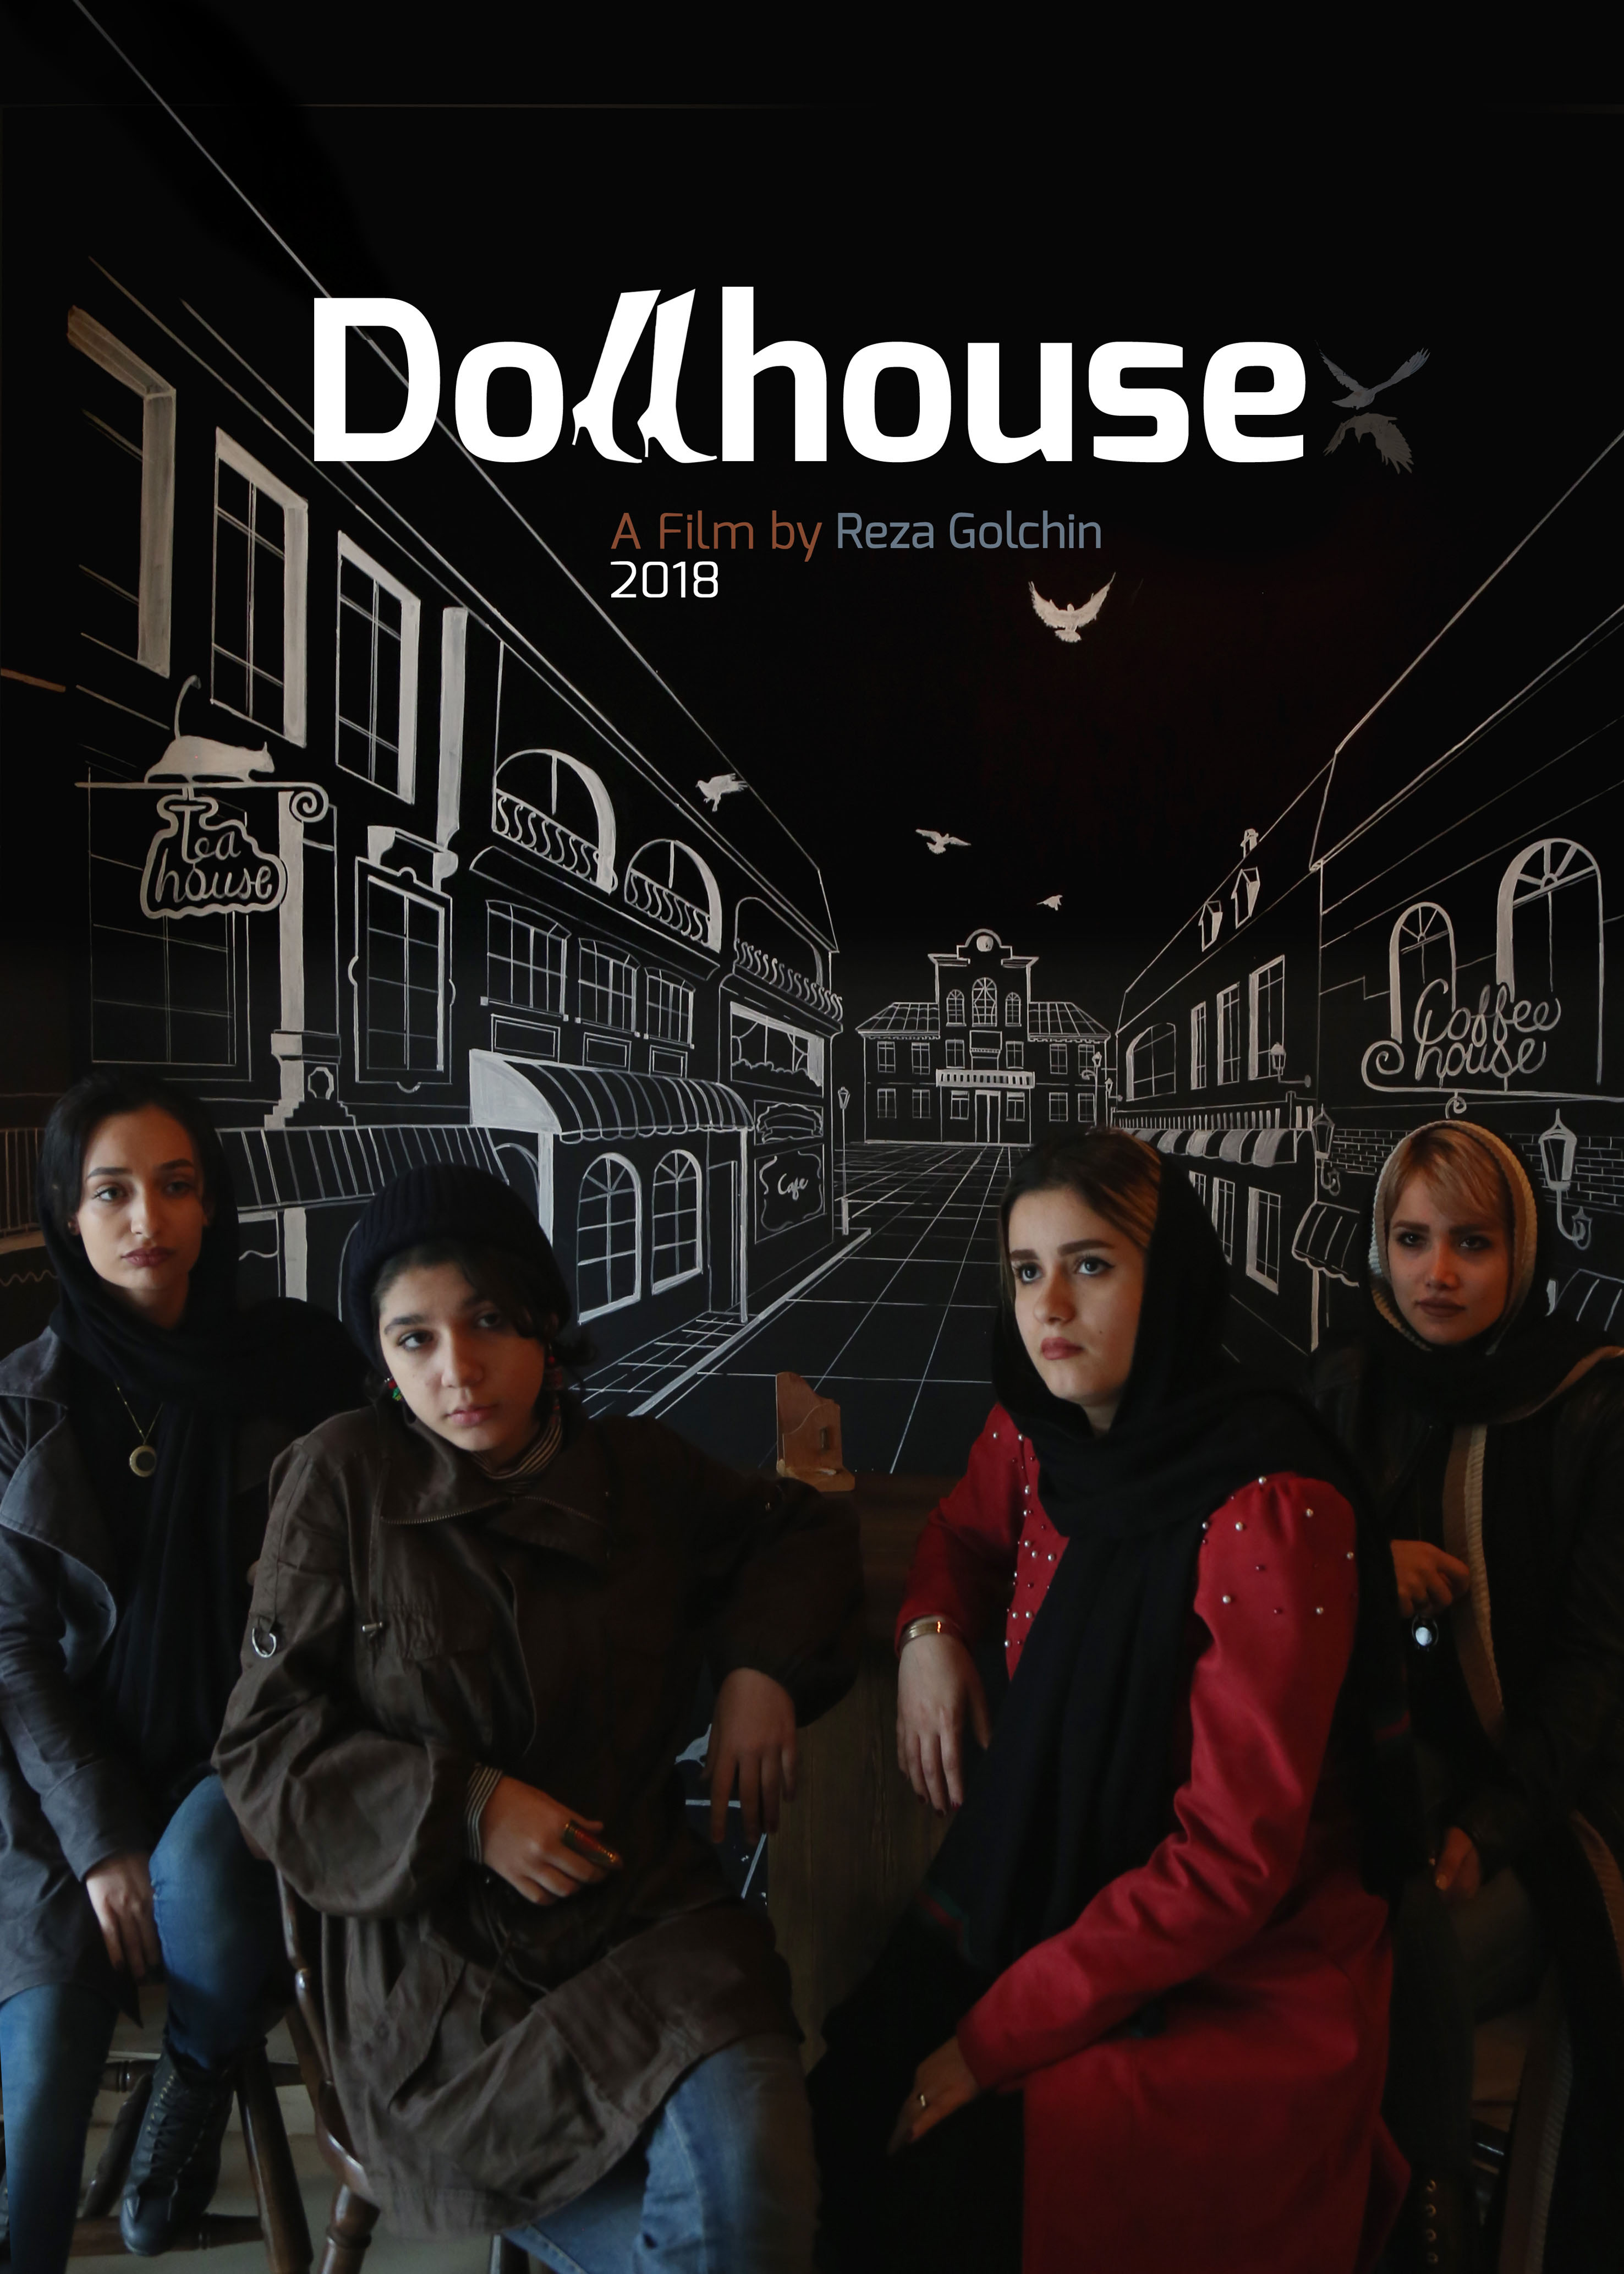 Dollhouse 2018 Imdb